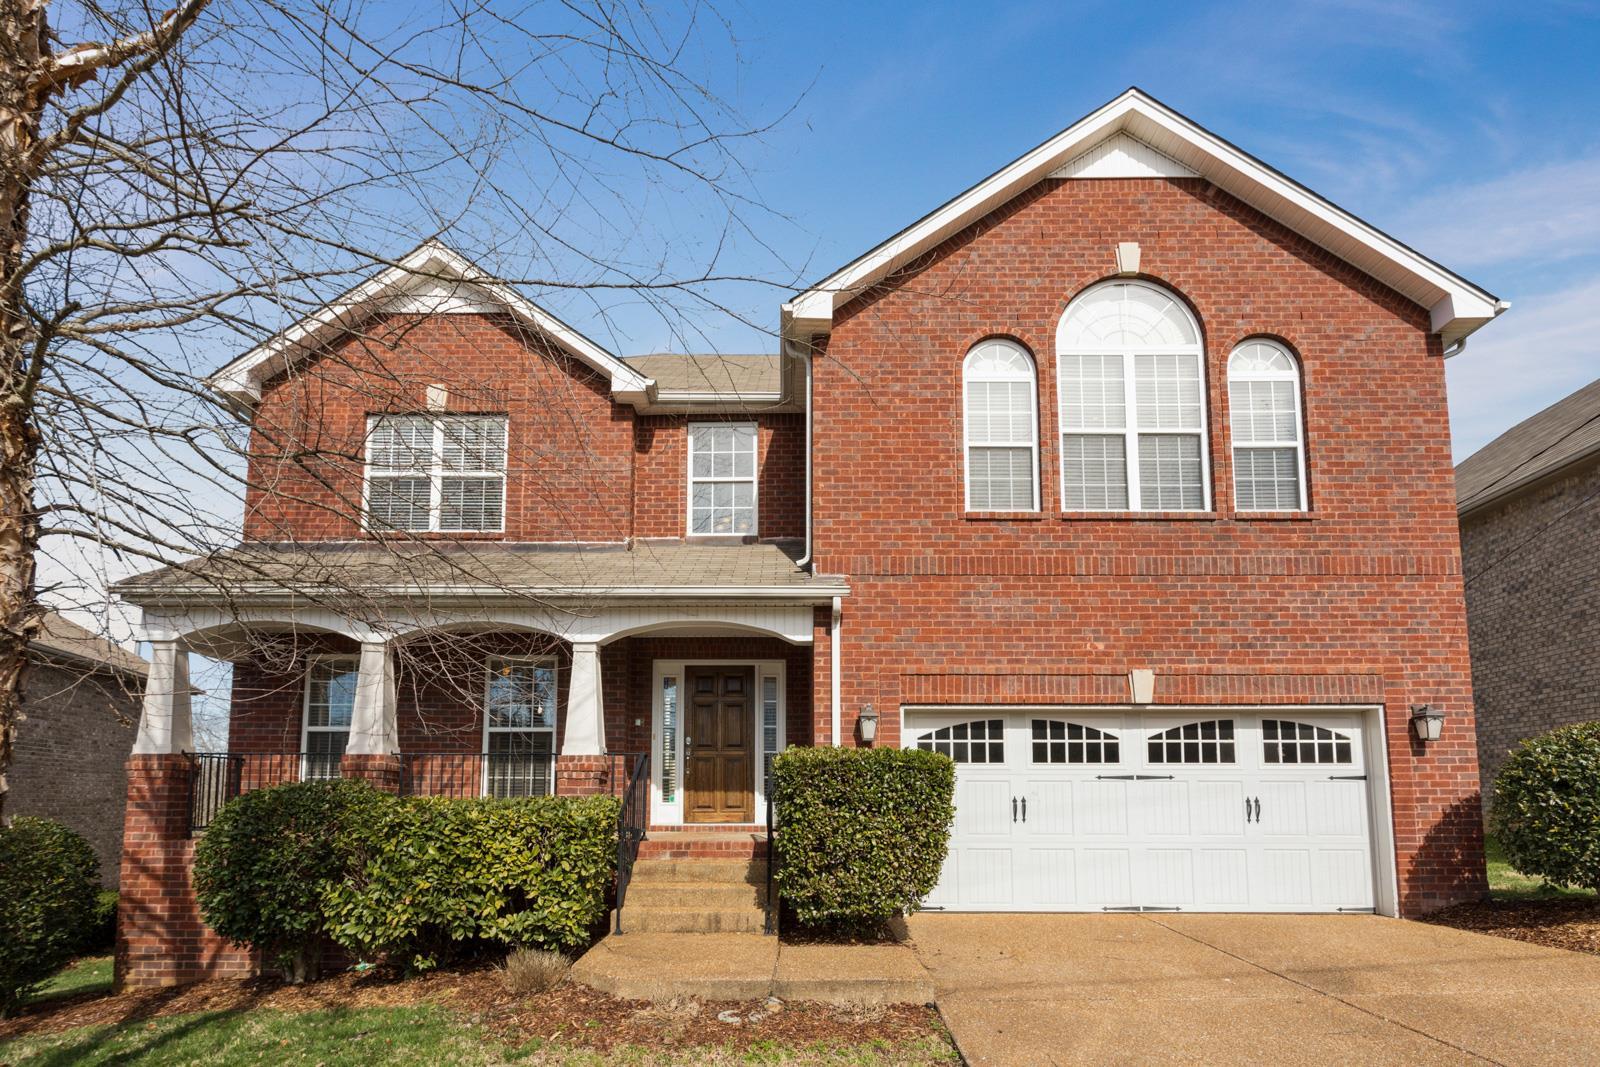 7436 Stecoah St, Nashville-Antioch, Tennessee